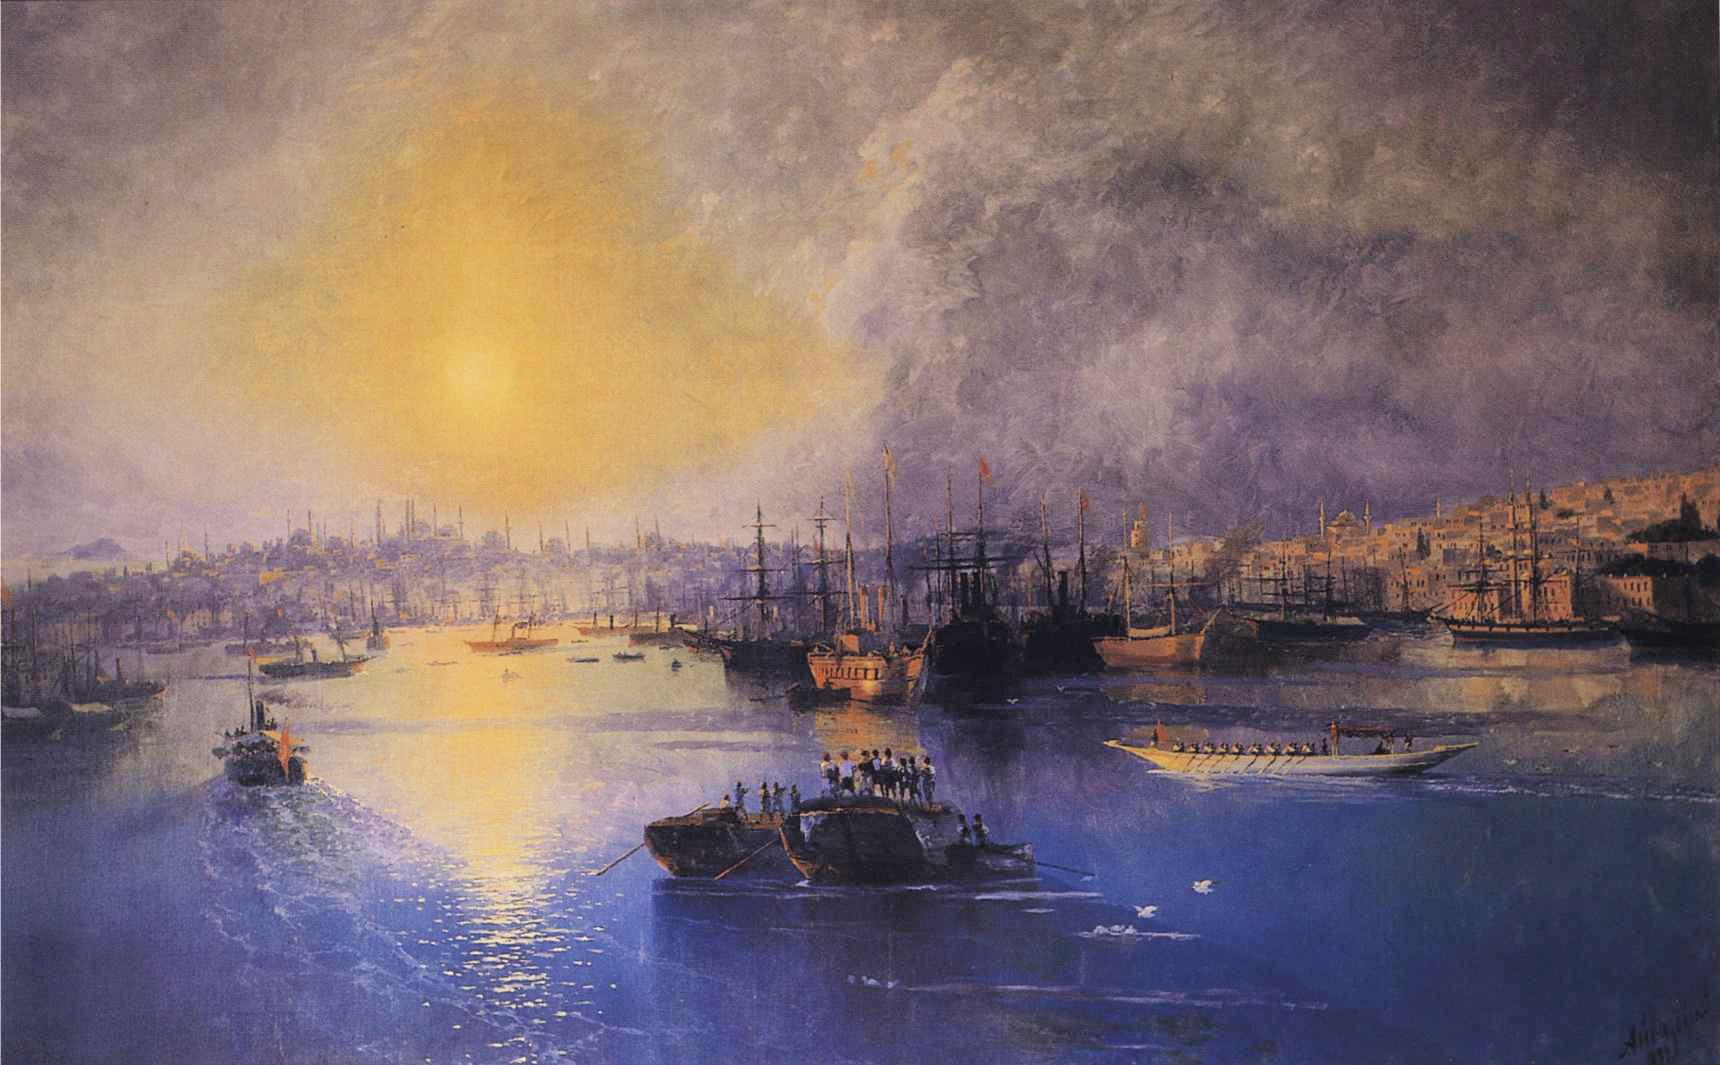 Ivan_Constantinovich_Aivazovsky_-_Constantinople_Sunset.jpg